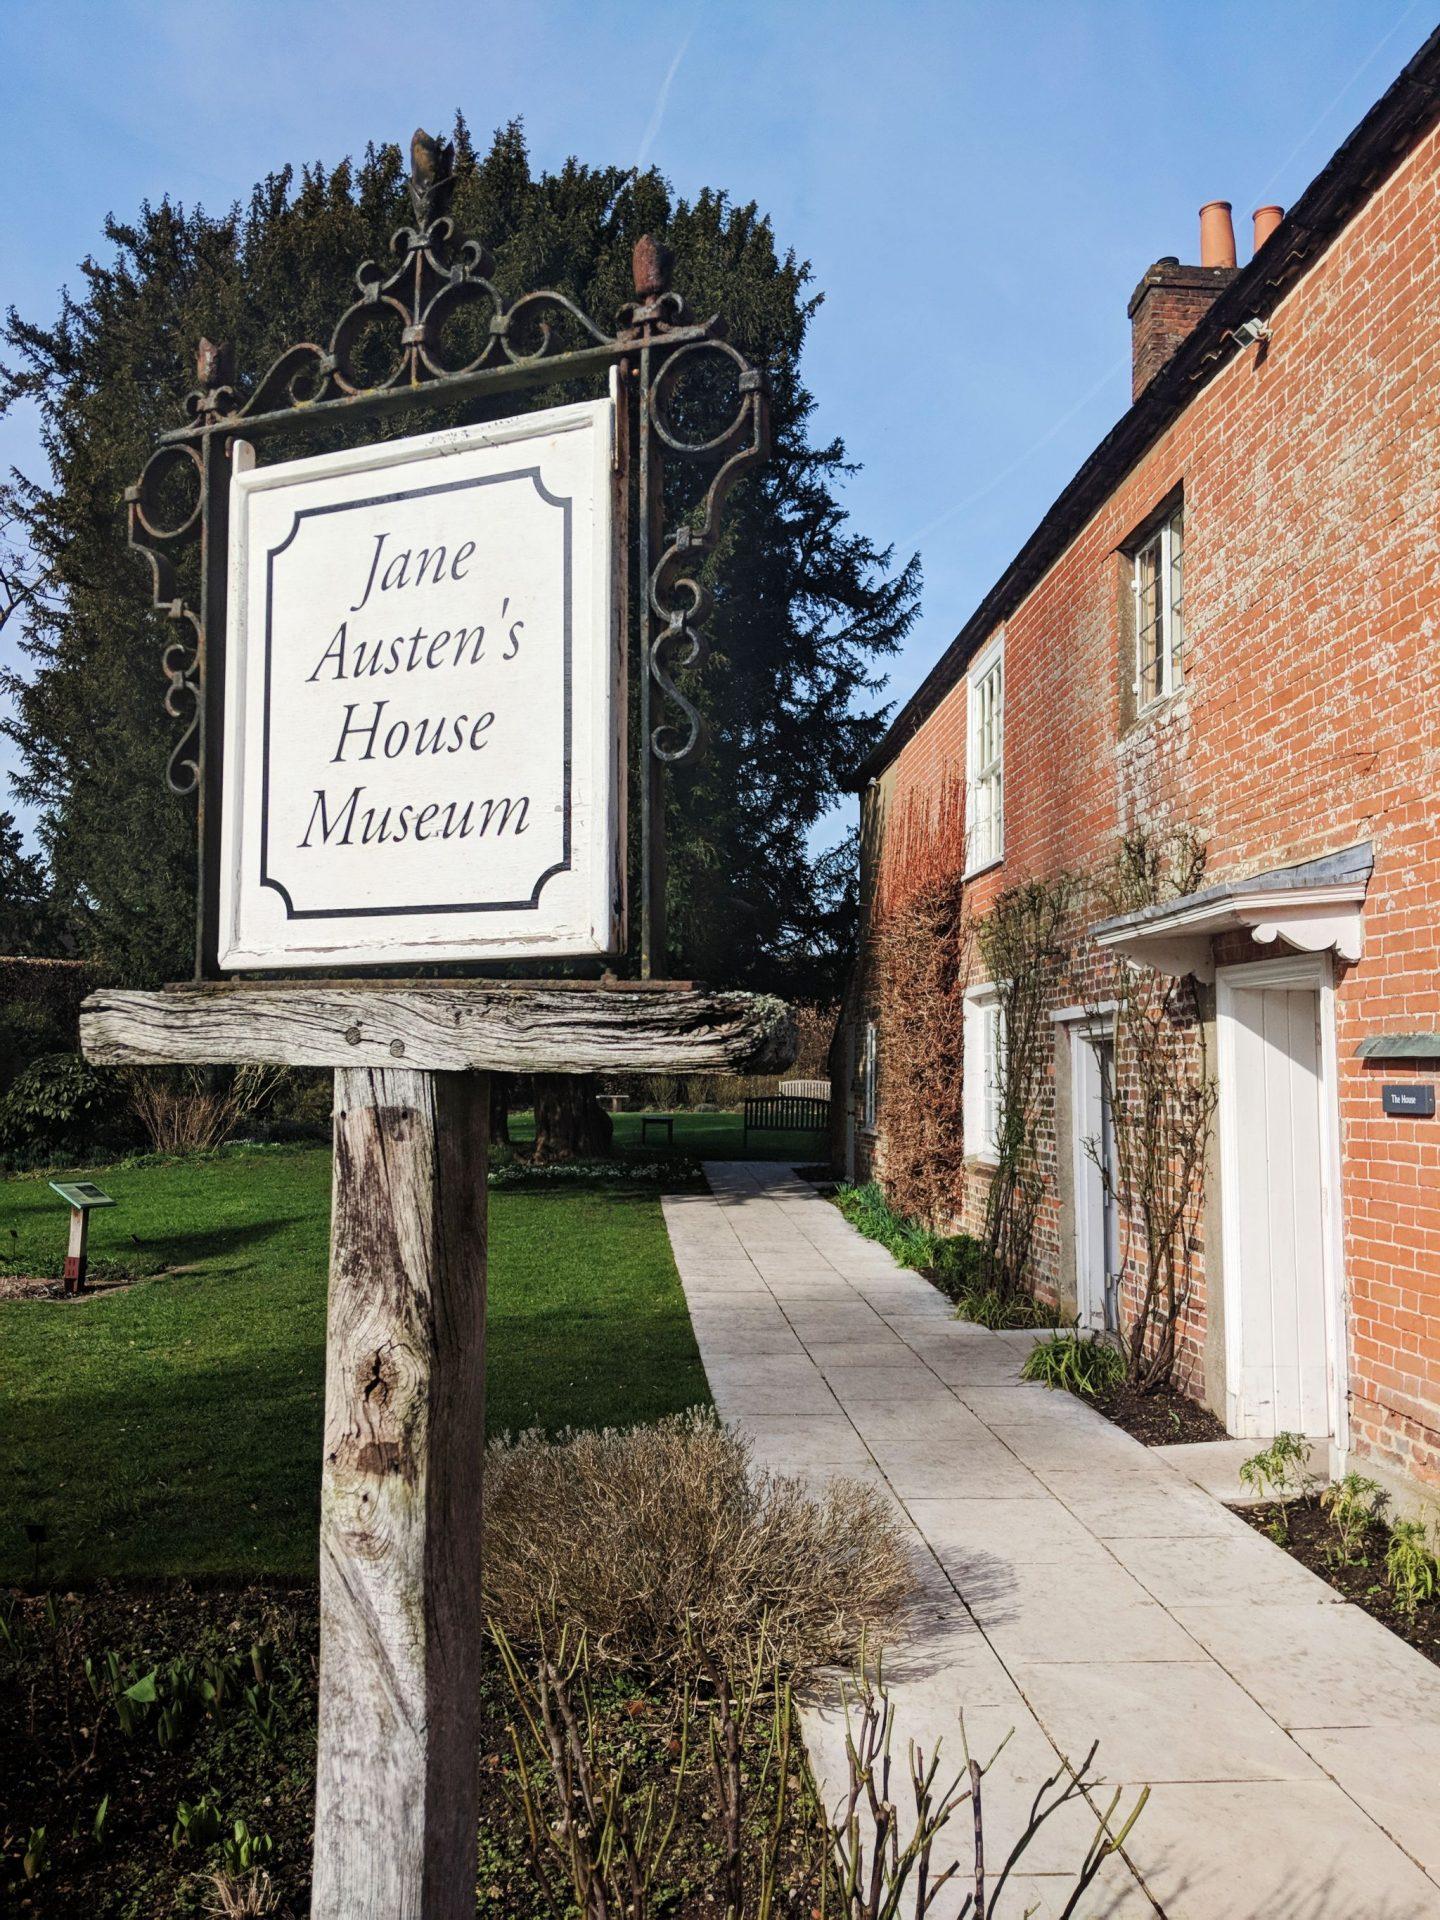 The Jane Austen's House Museum